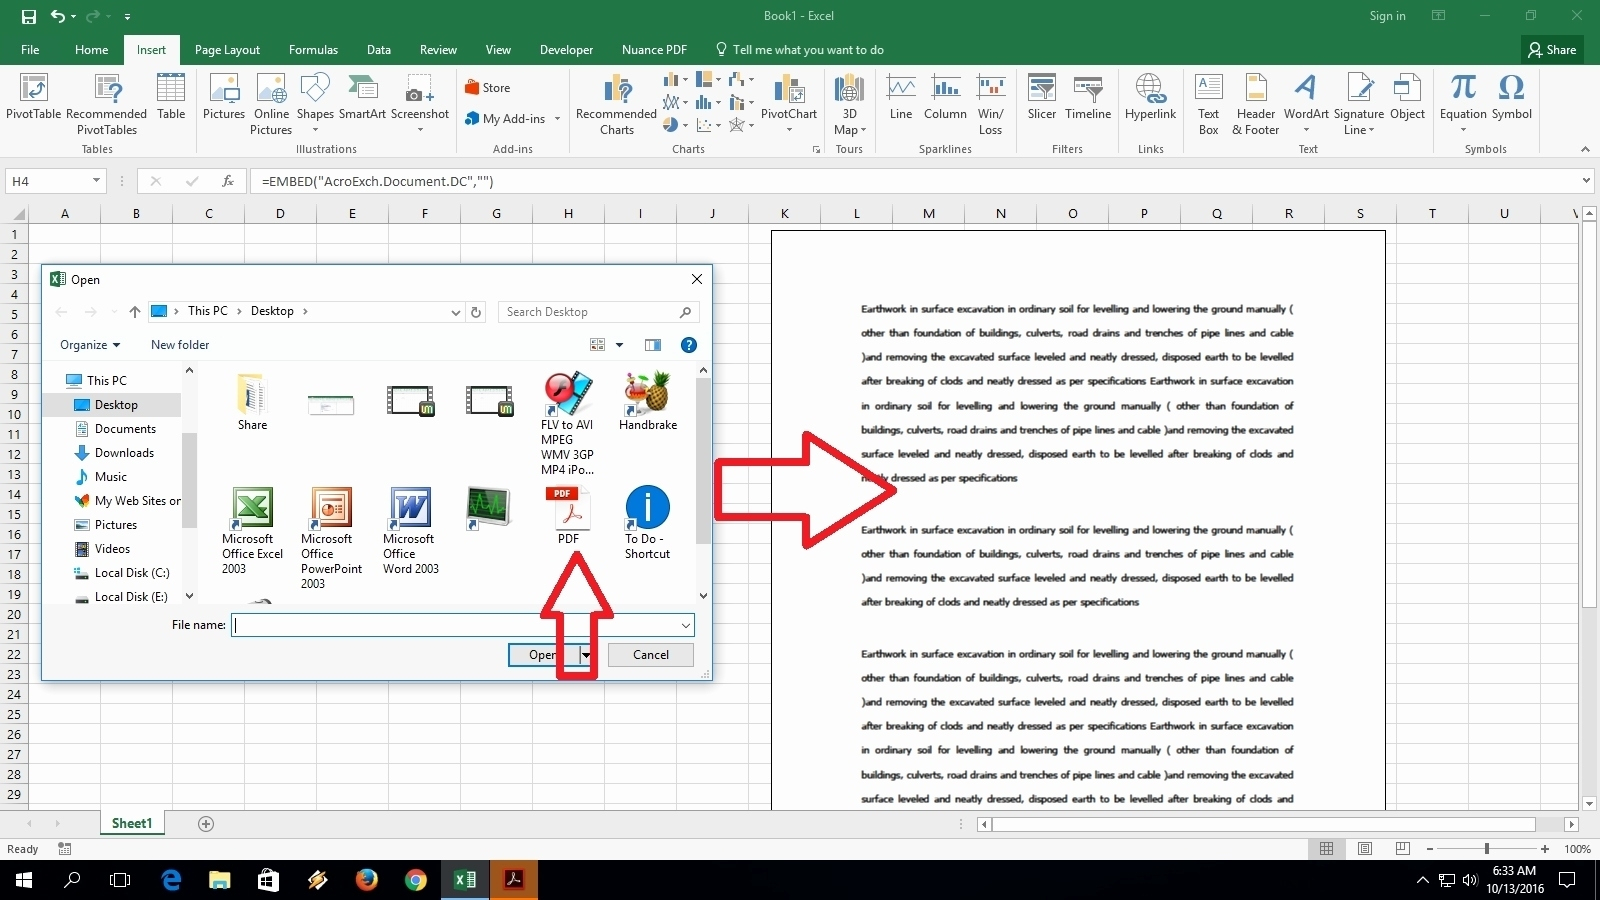 Convert Pdf To Excel Spreadsheet Unique Convert Pdf File To Excel Intended For How To Convert Pdf File To Excel Spreadsheet